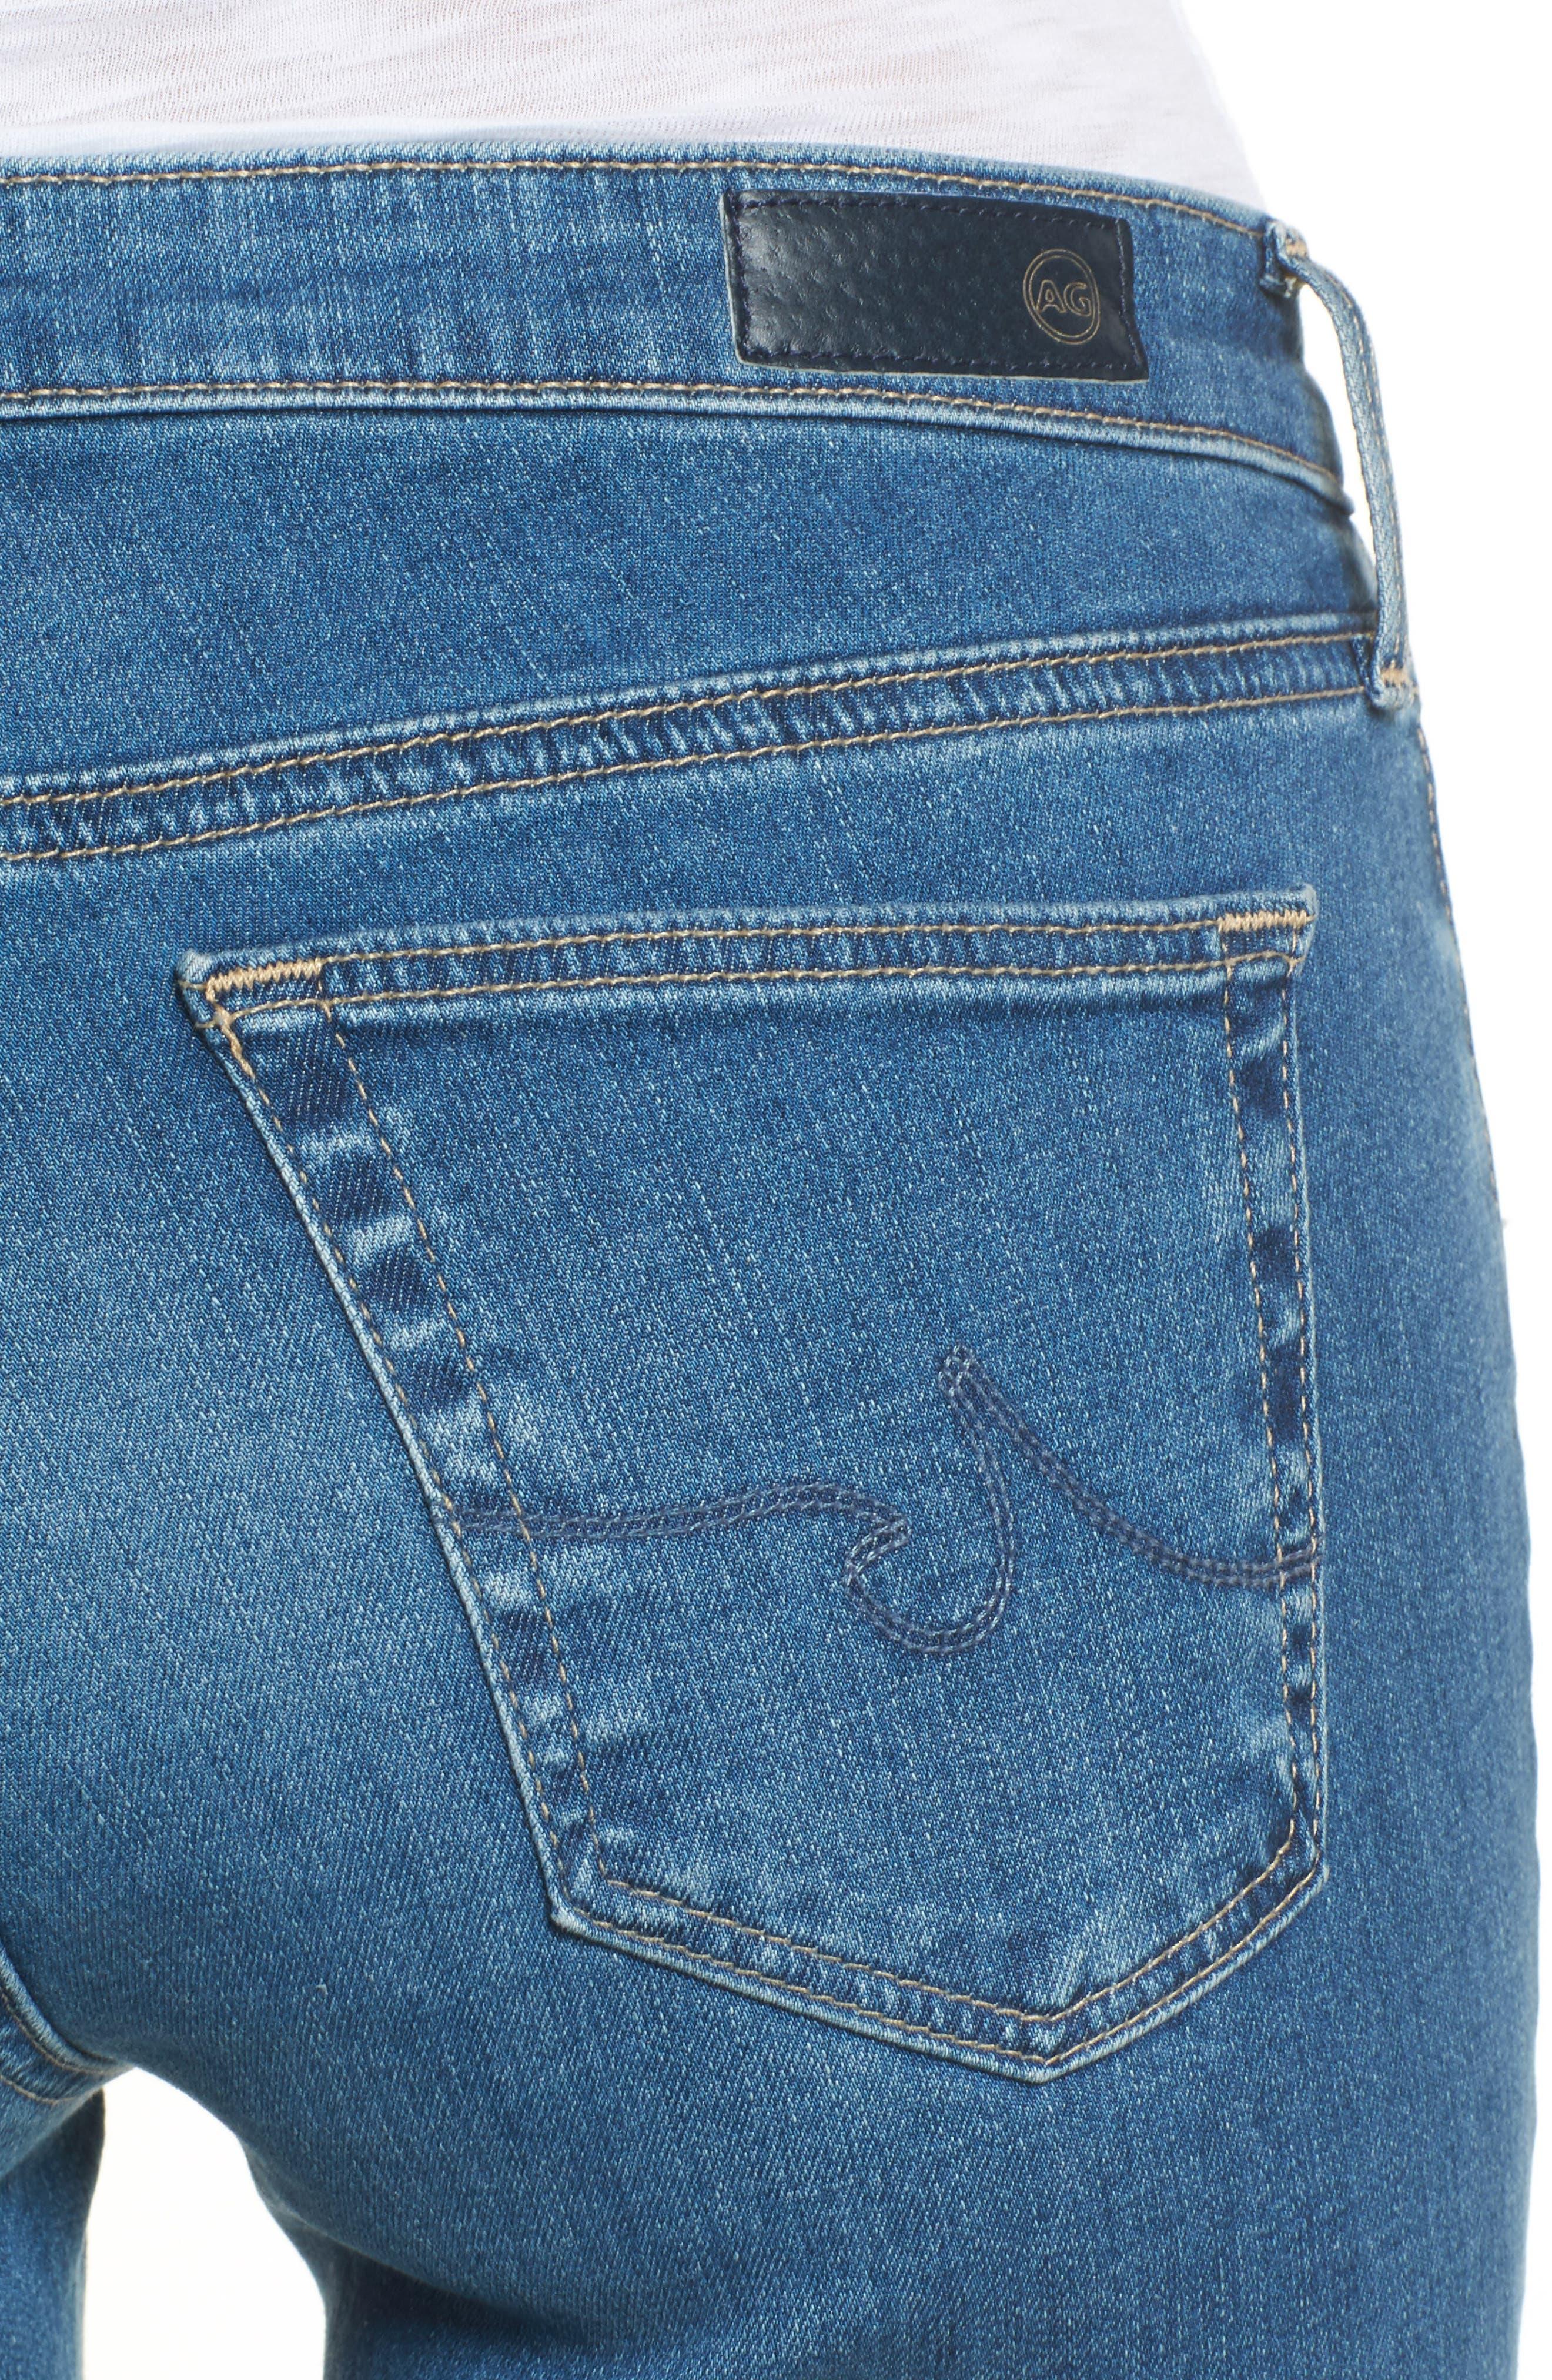 'The Legging' Super Skinny Jeans,                             Alternate thumbnail 40, color,